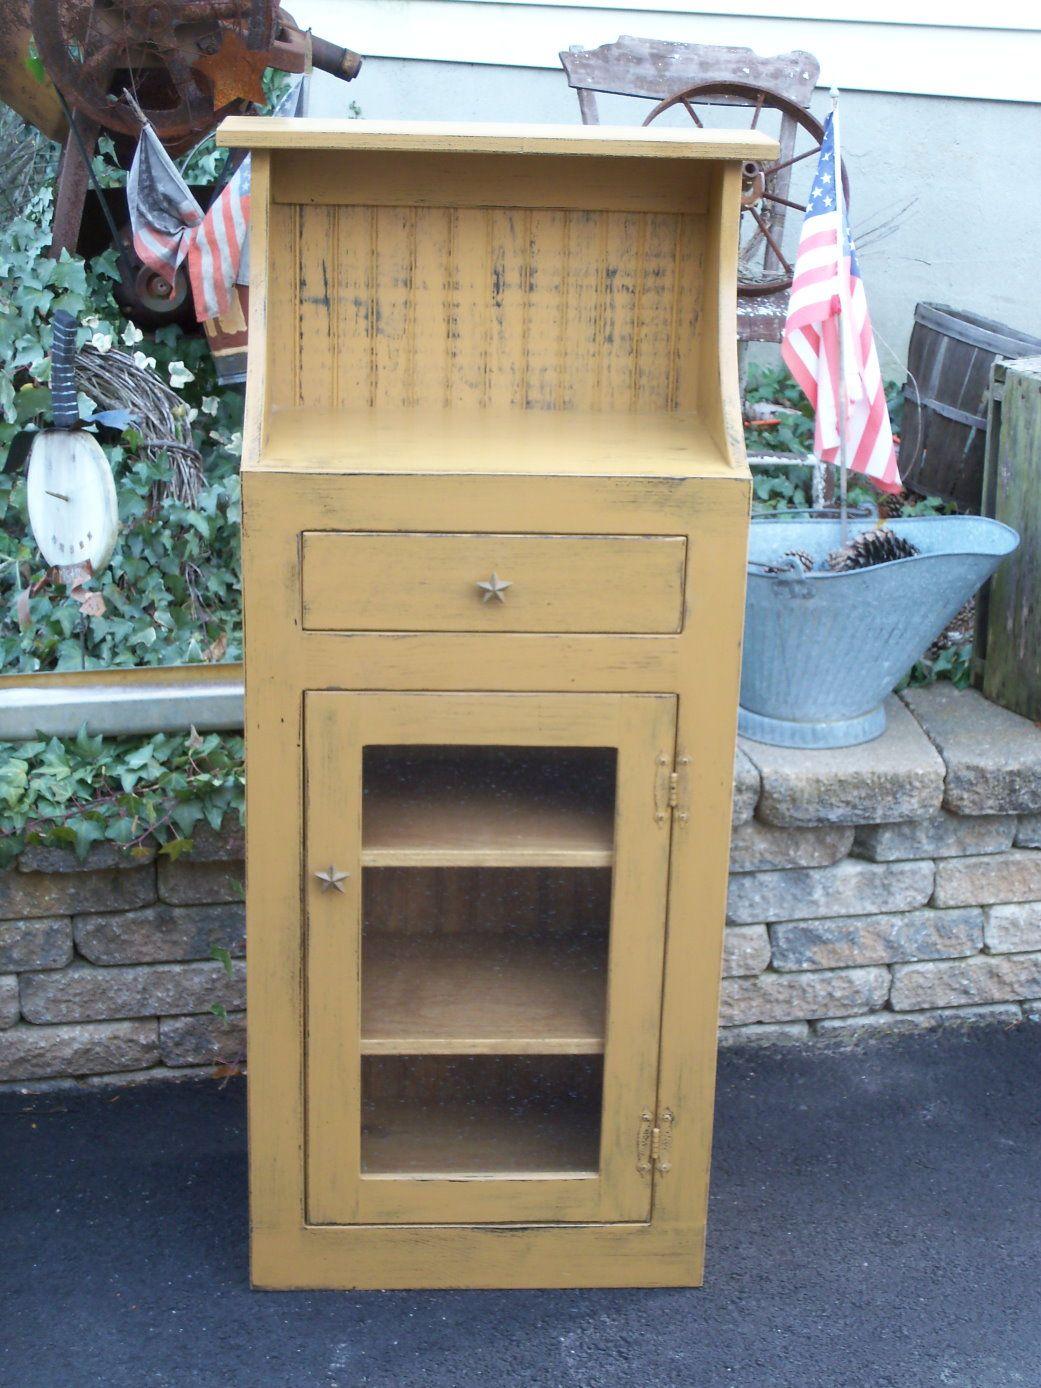 Furniture Pie Safes Jelly Cabinets Primitive Decorating Country Primitive Bathrooms Primitive Furniture